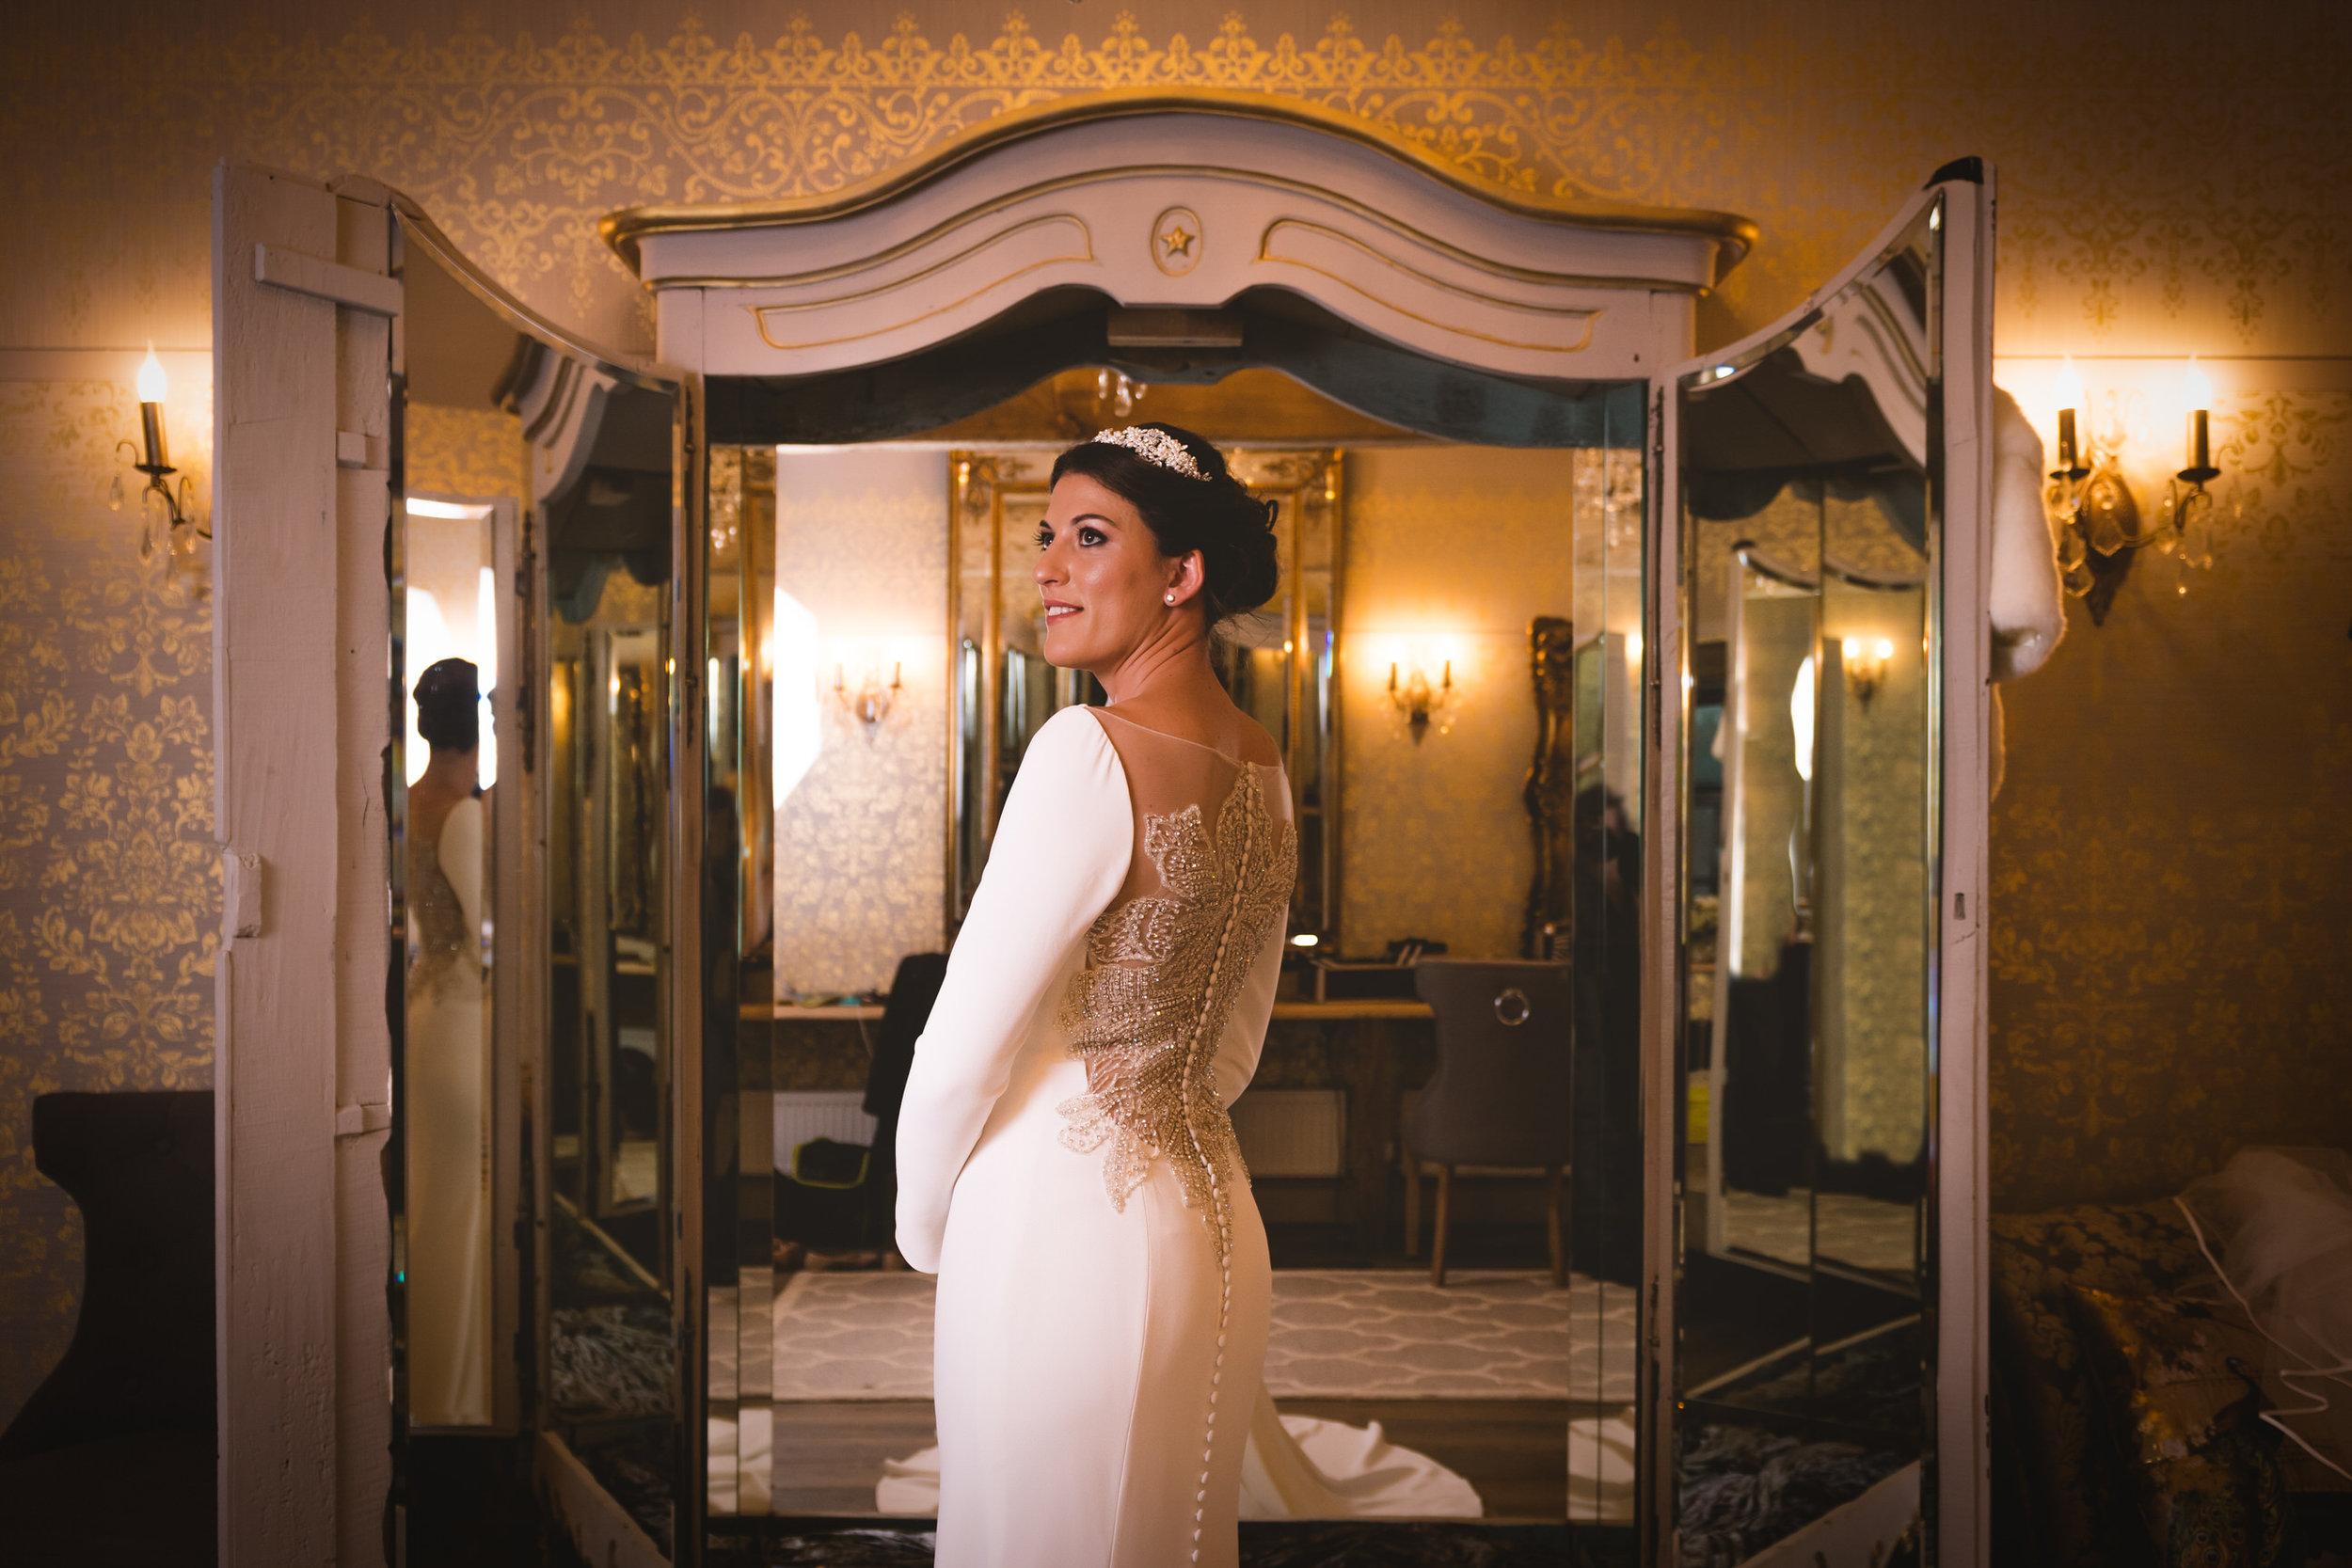 wharfedale-grange-harrogate-wedding-photographer-44.jpg